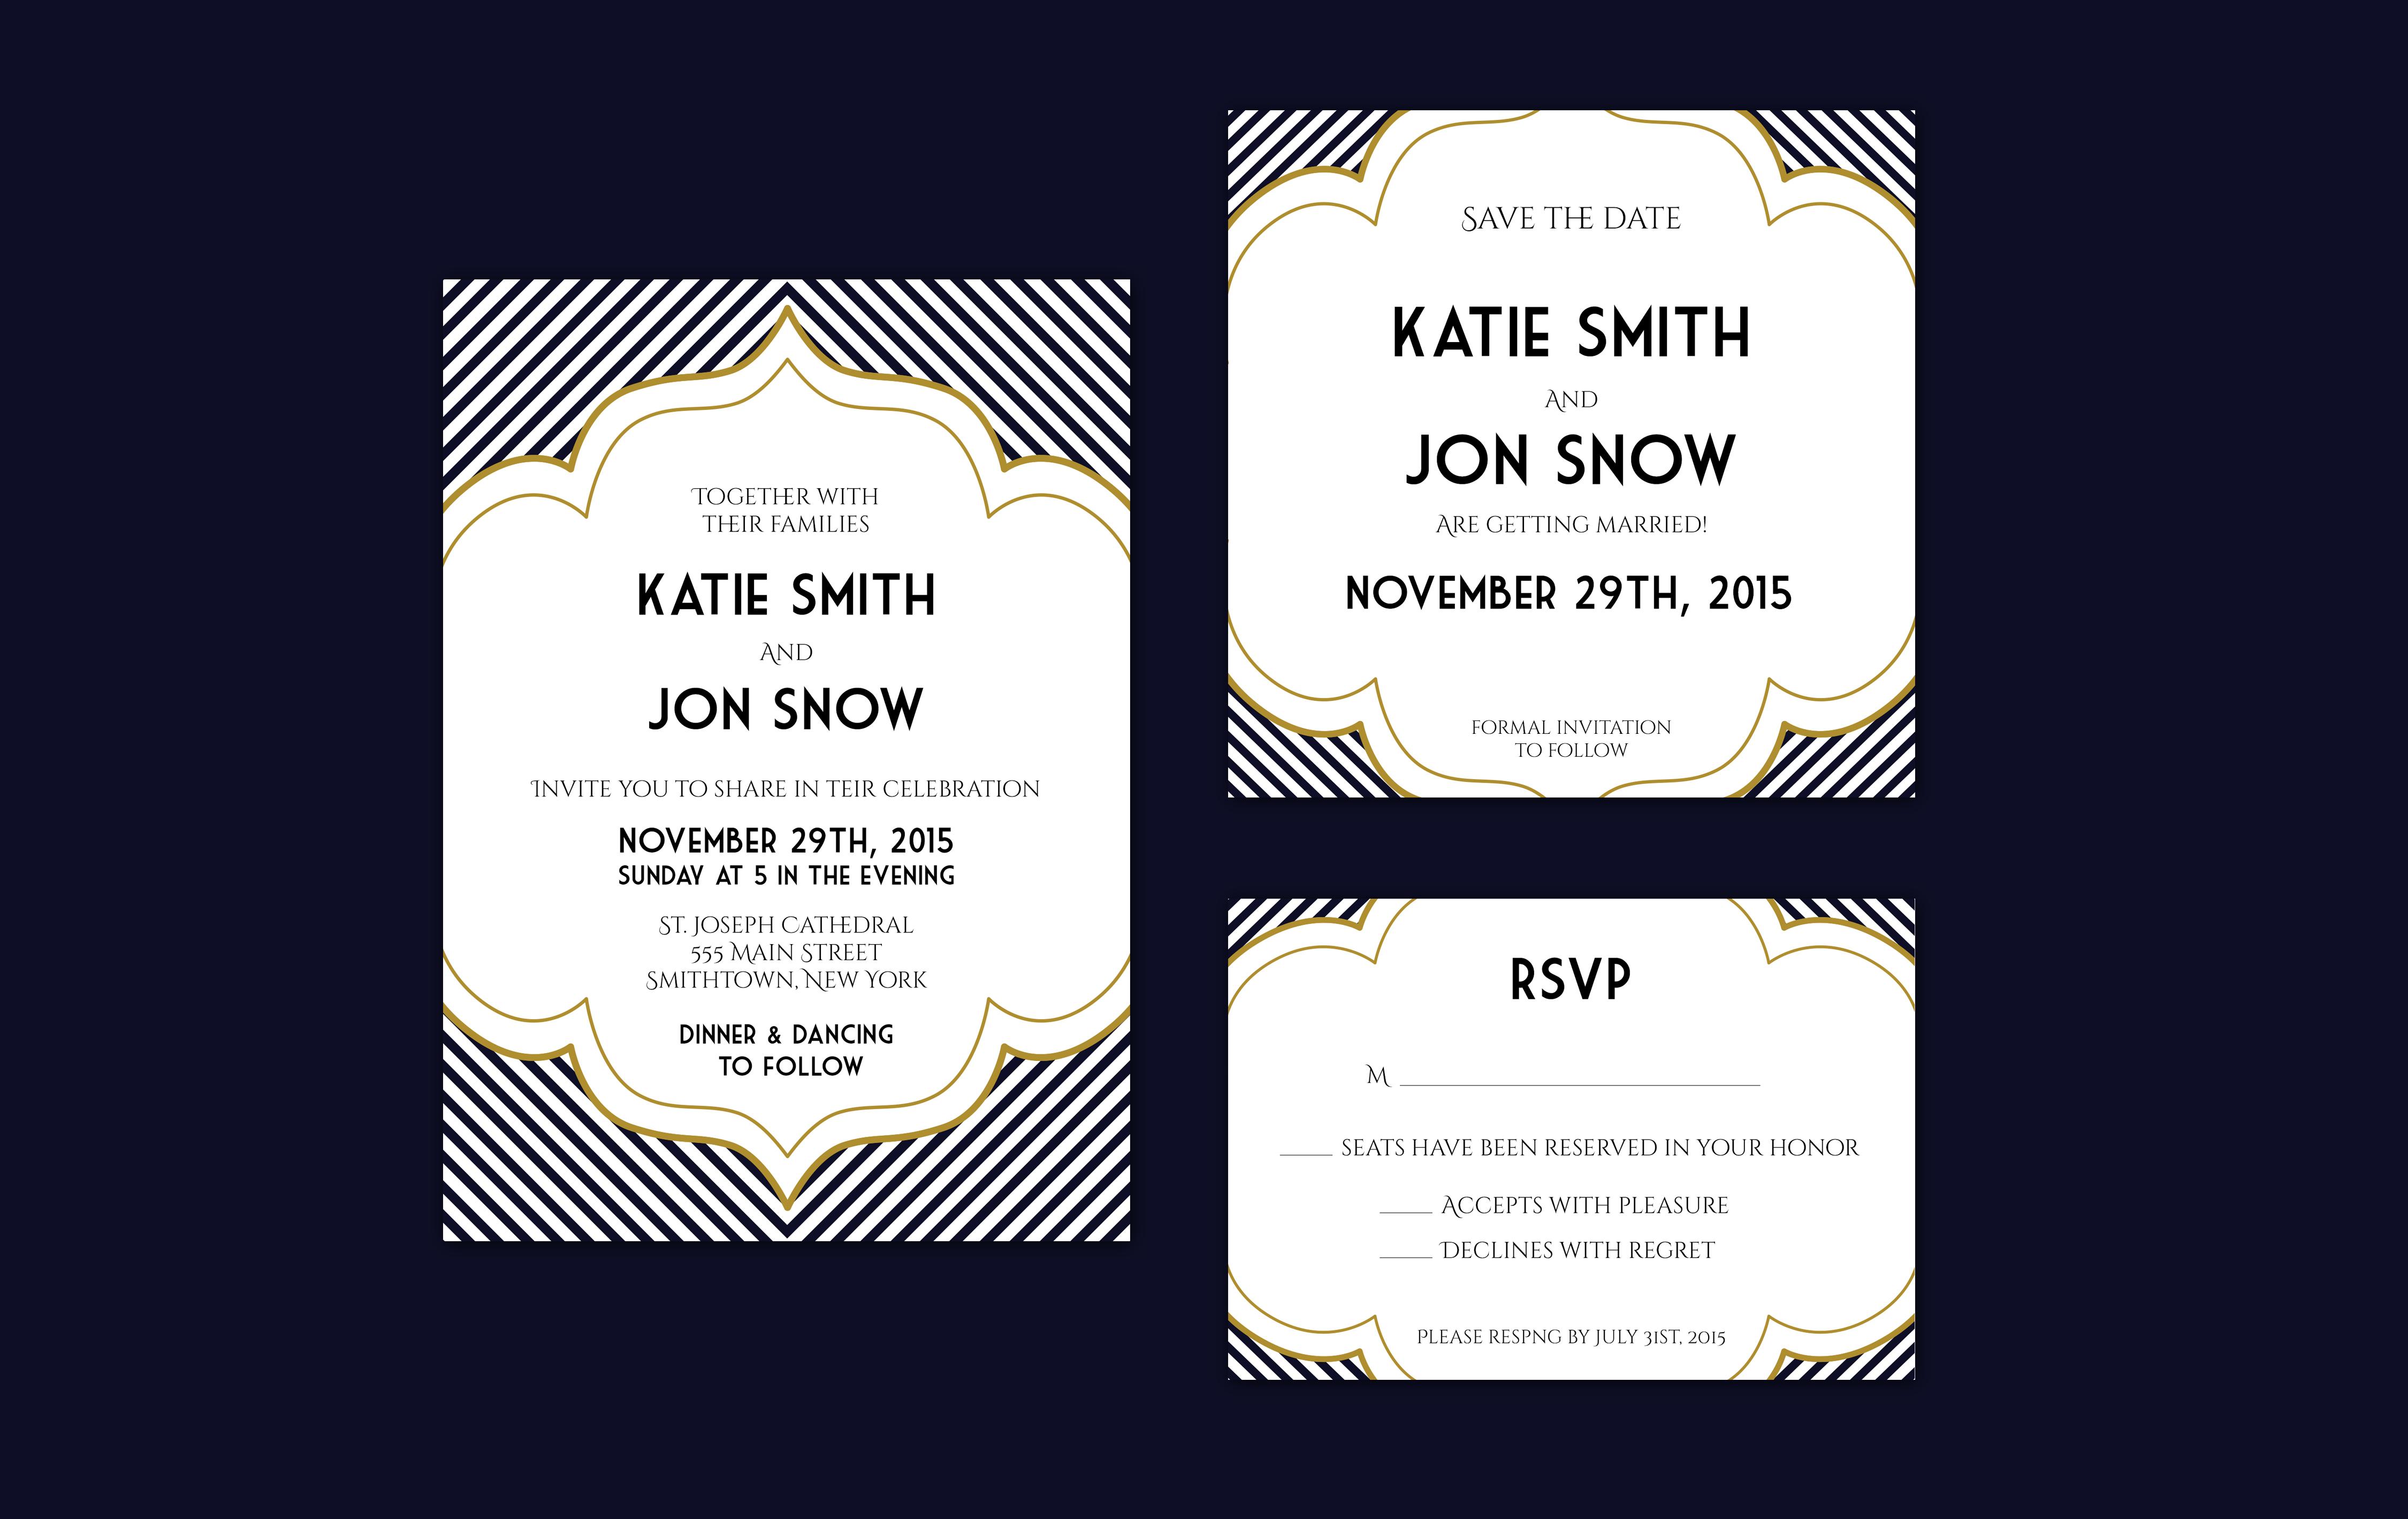 Deco Wedding Invitations: Art Deco Inspired Wedding Invitation